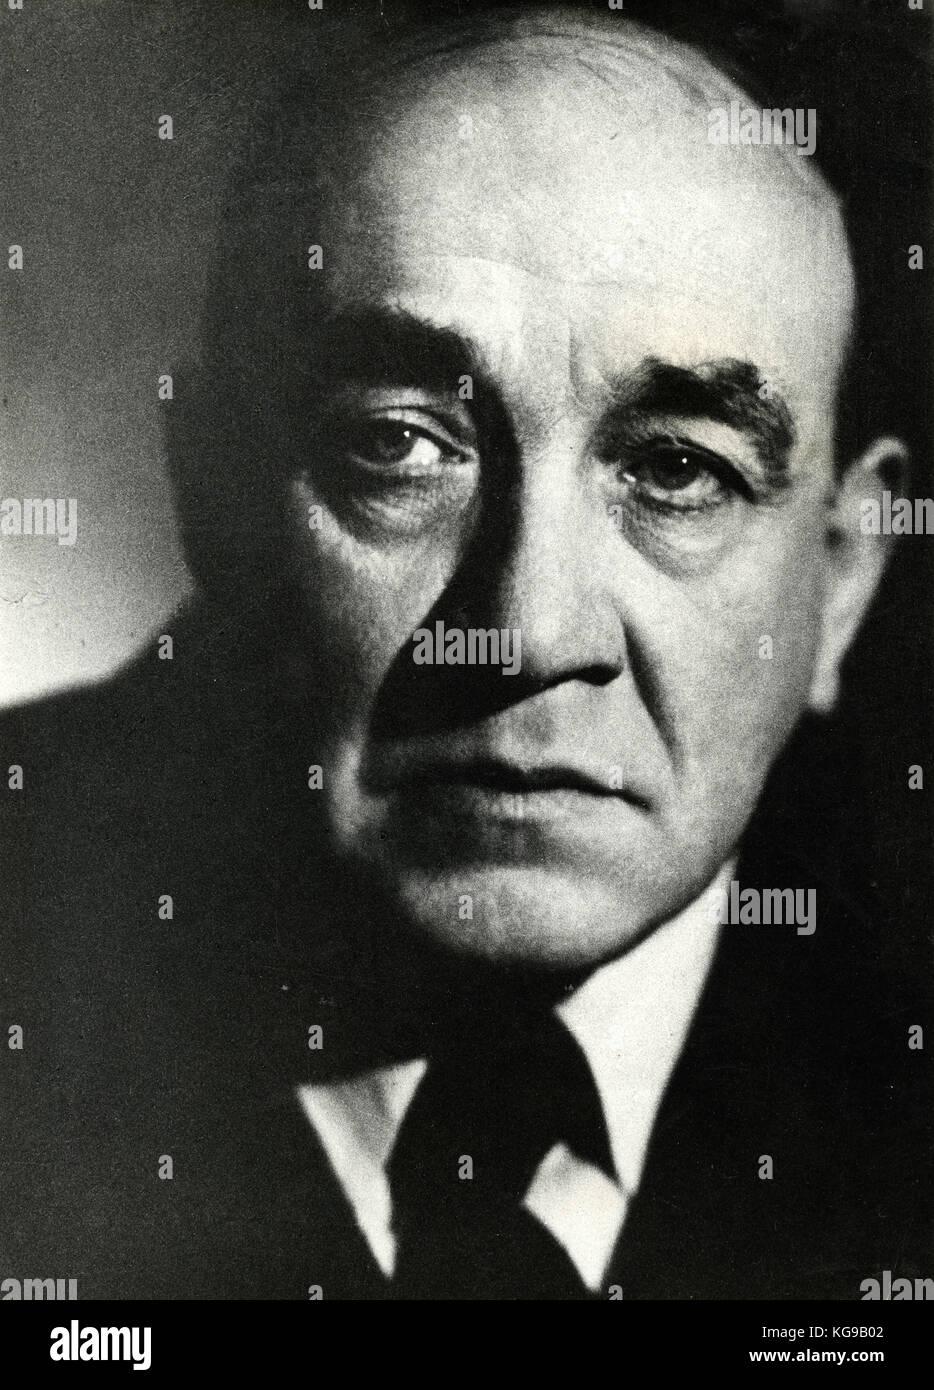 Polish theatre and film director Leon Schiller - Stock Image